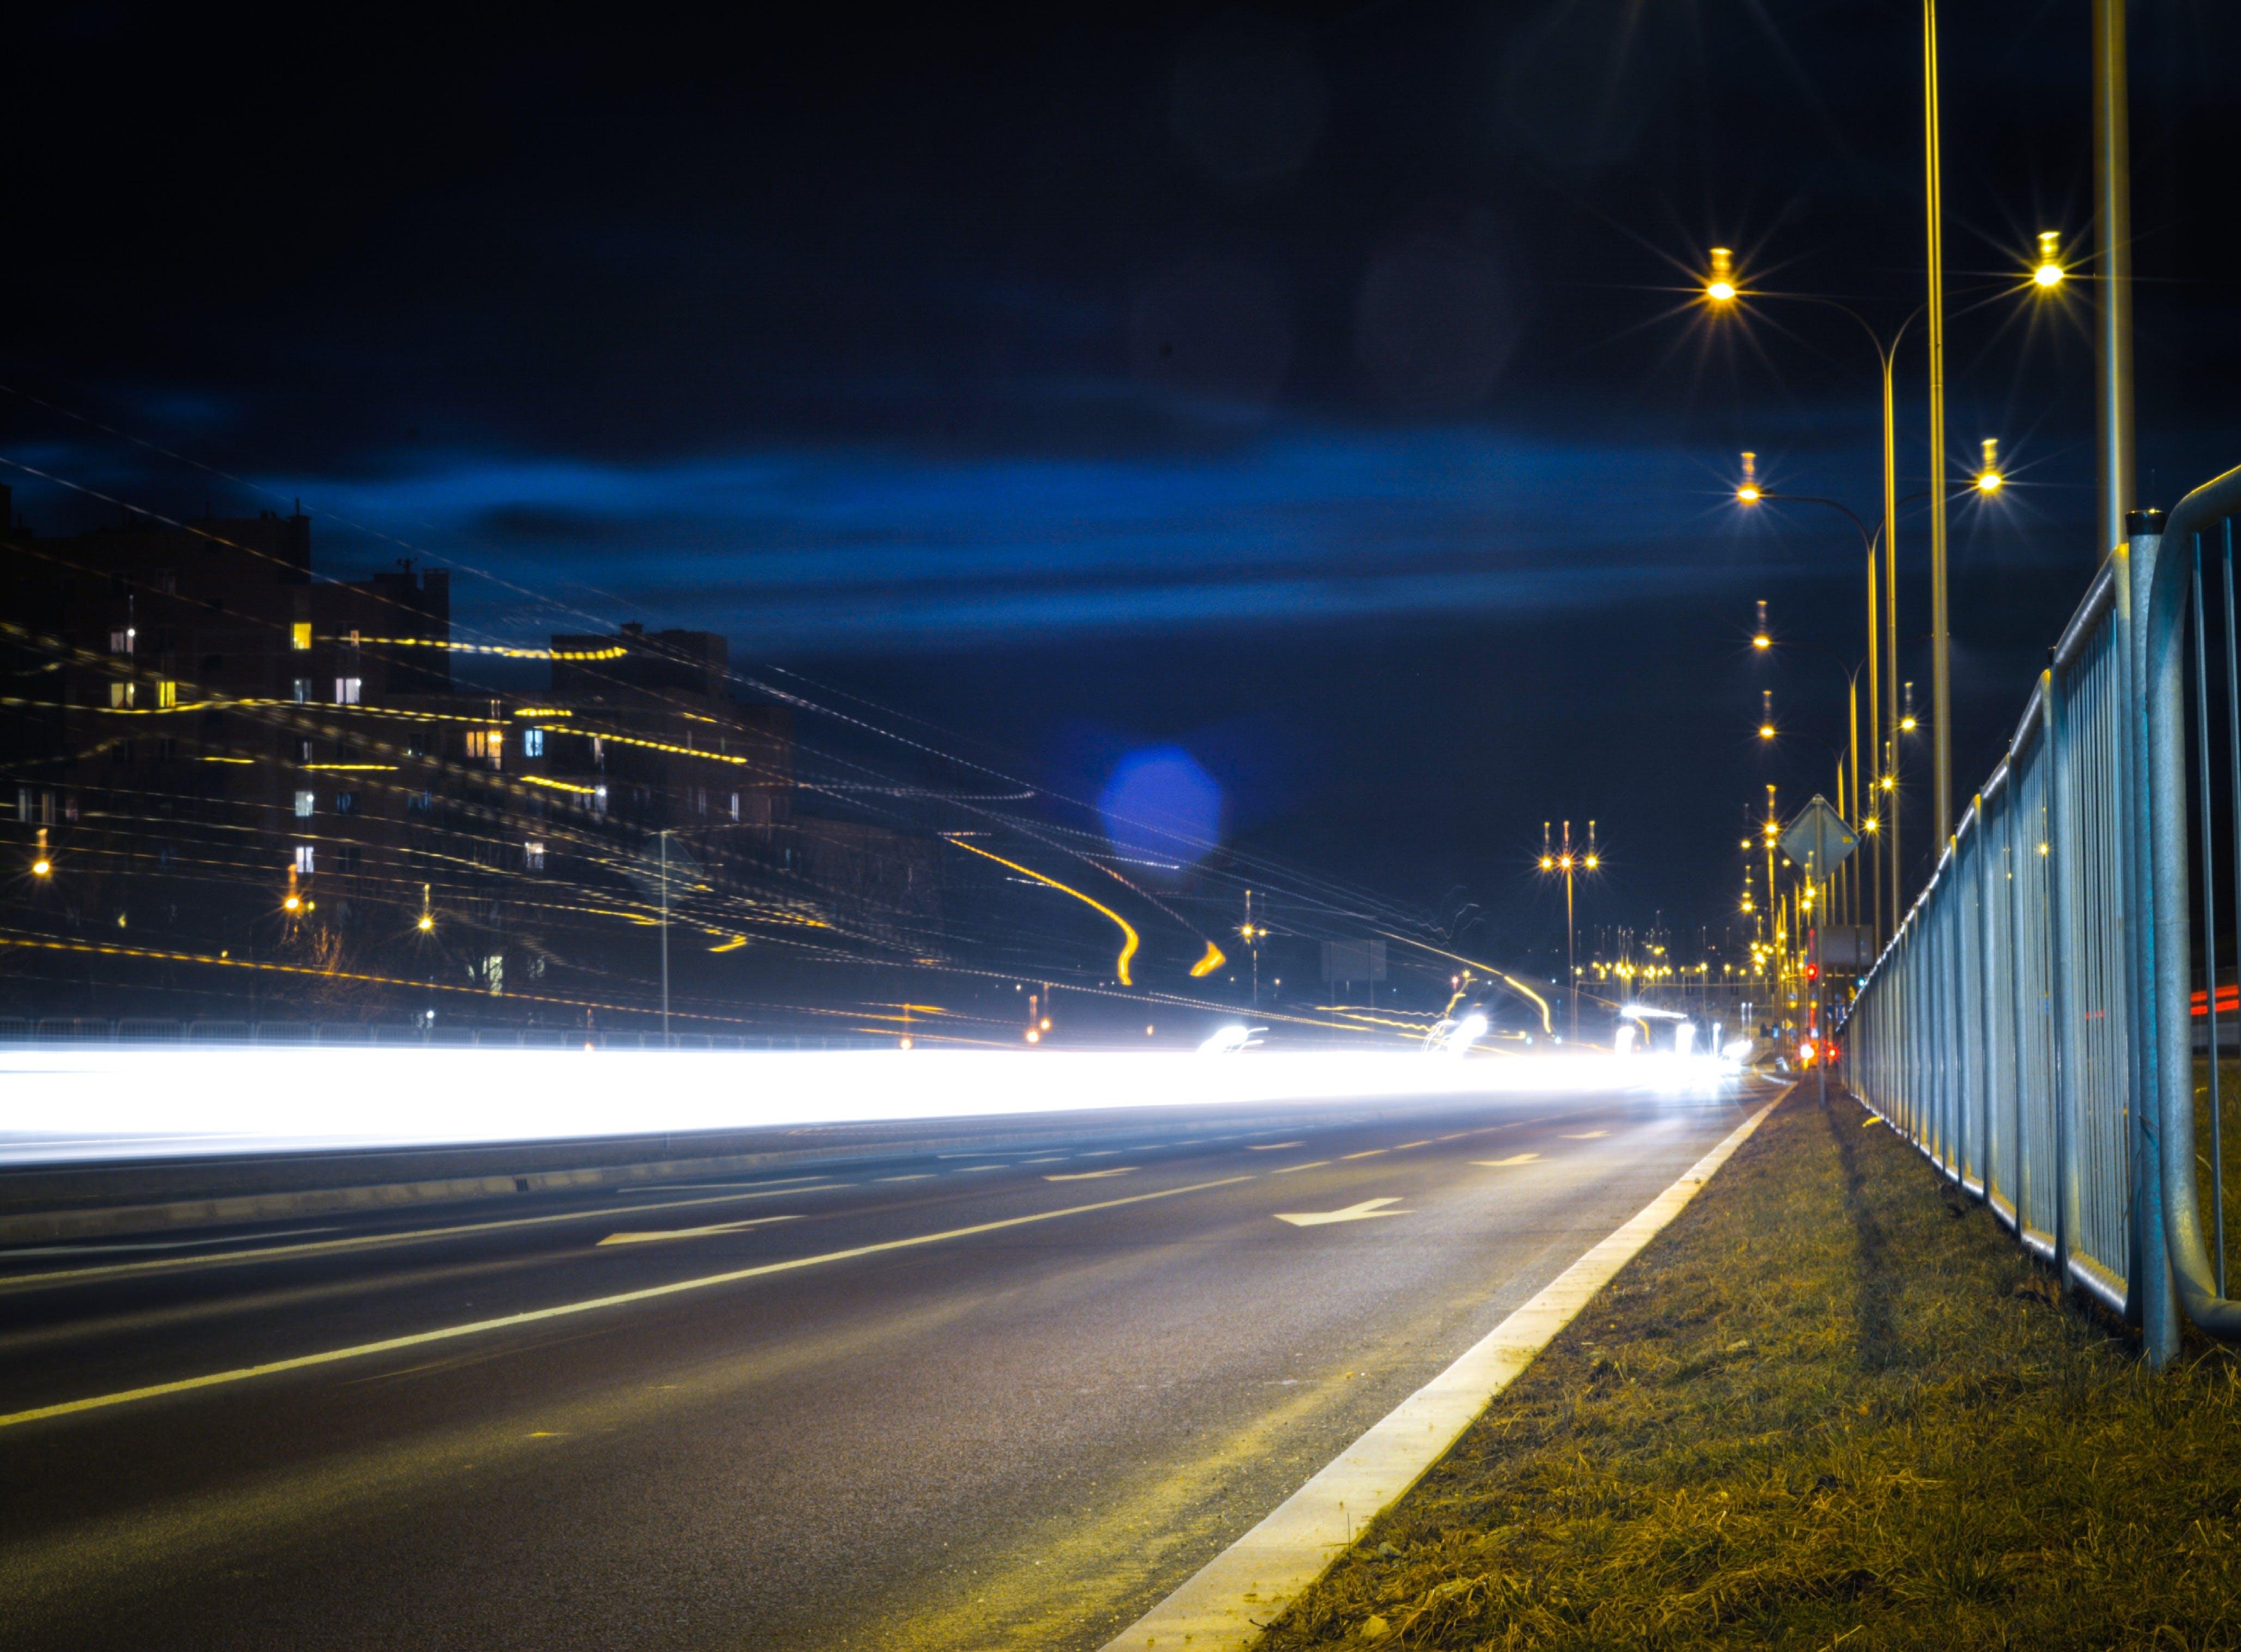 Time-lapse Photography of Streak Lights